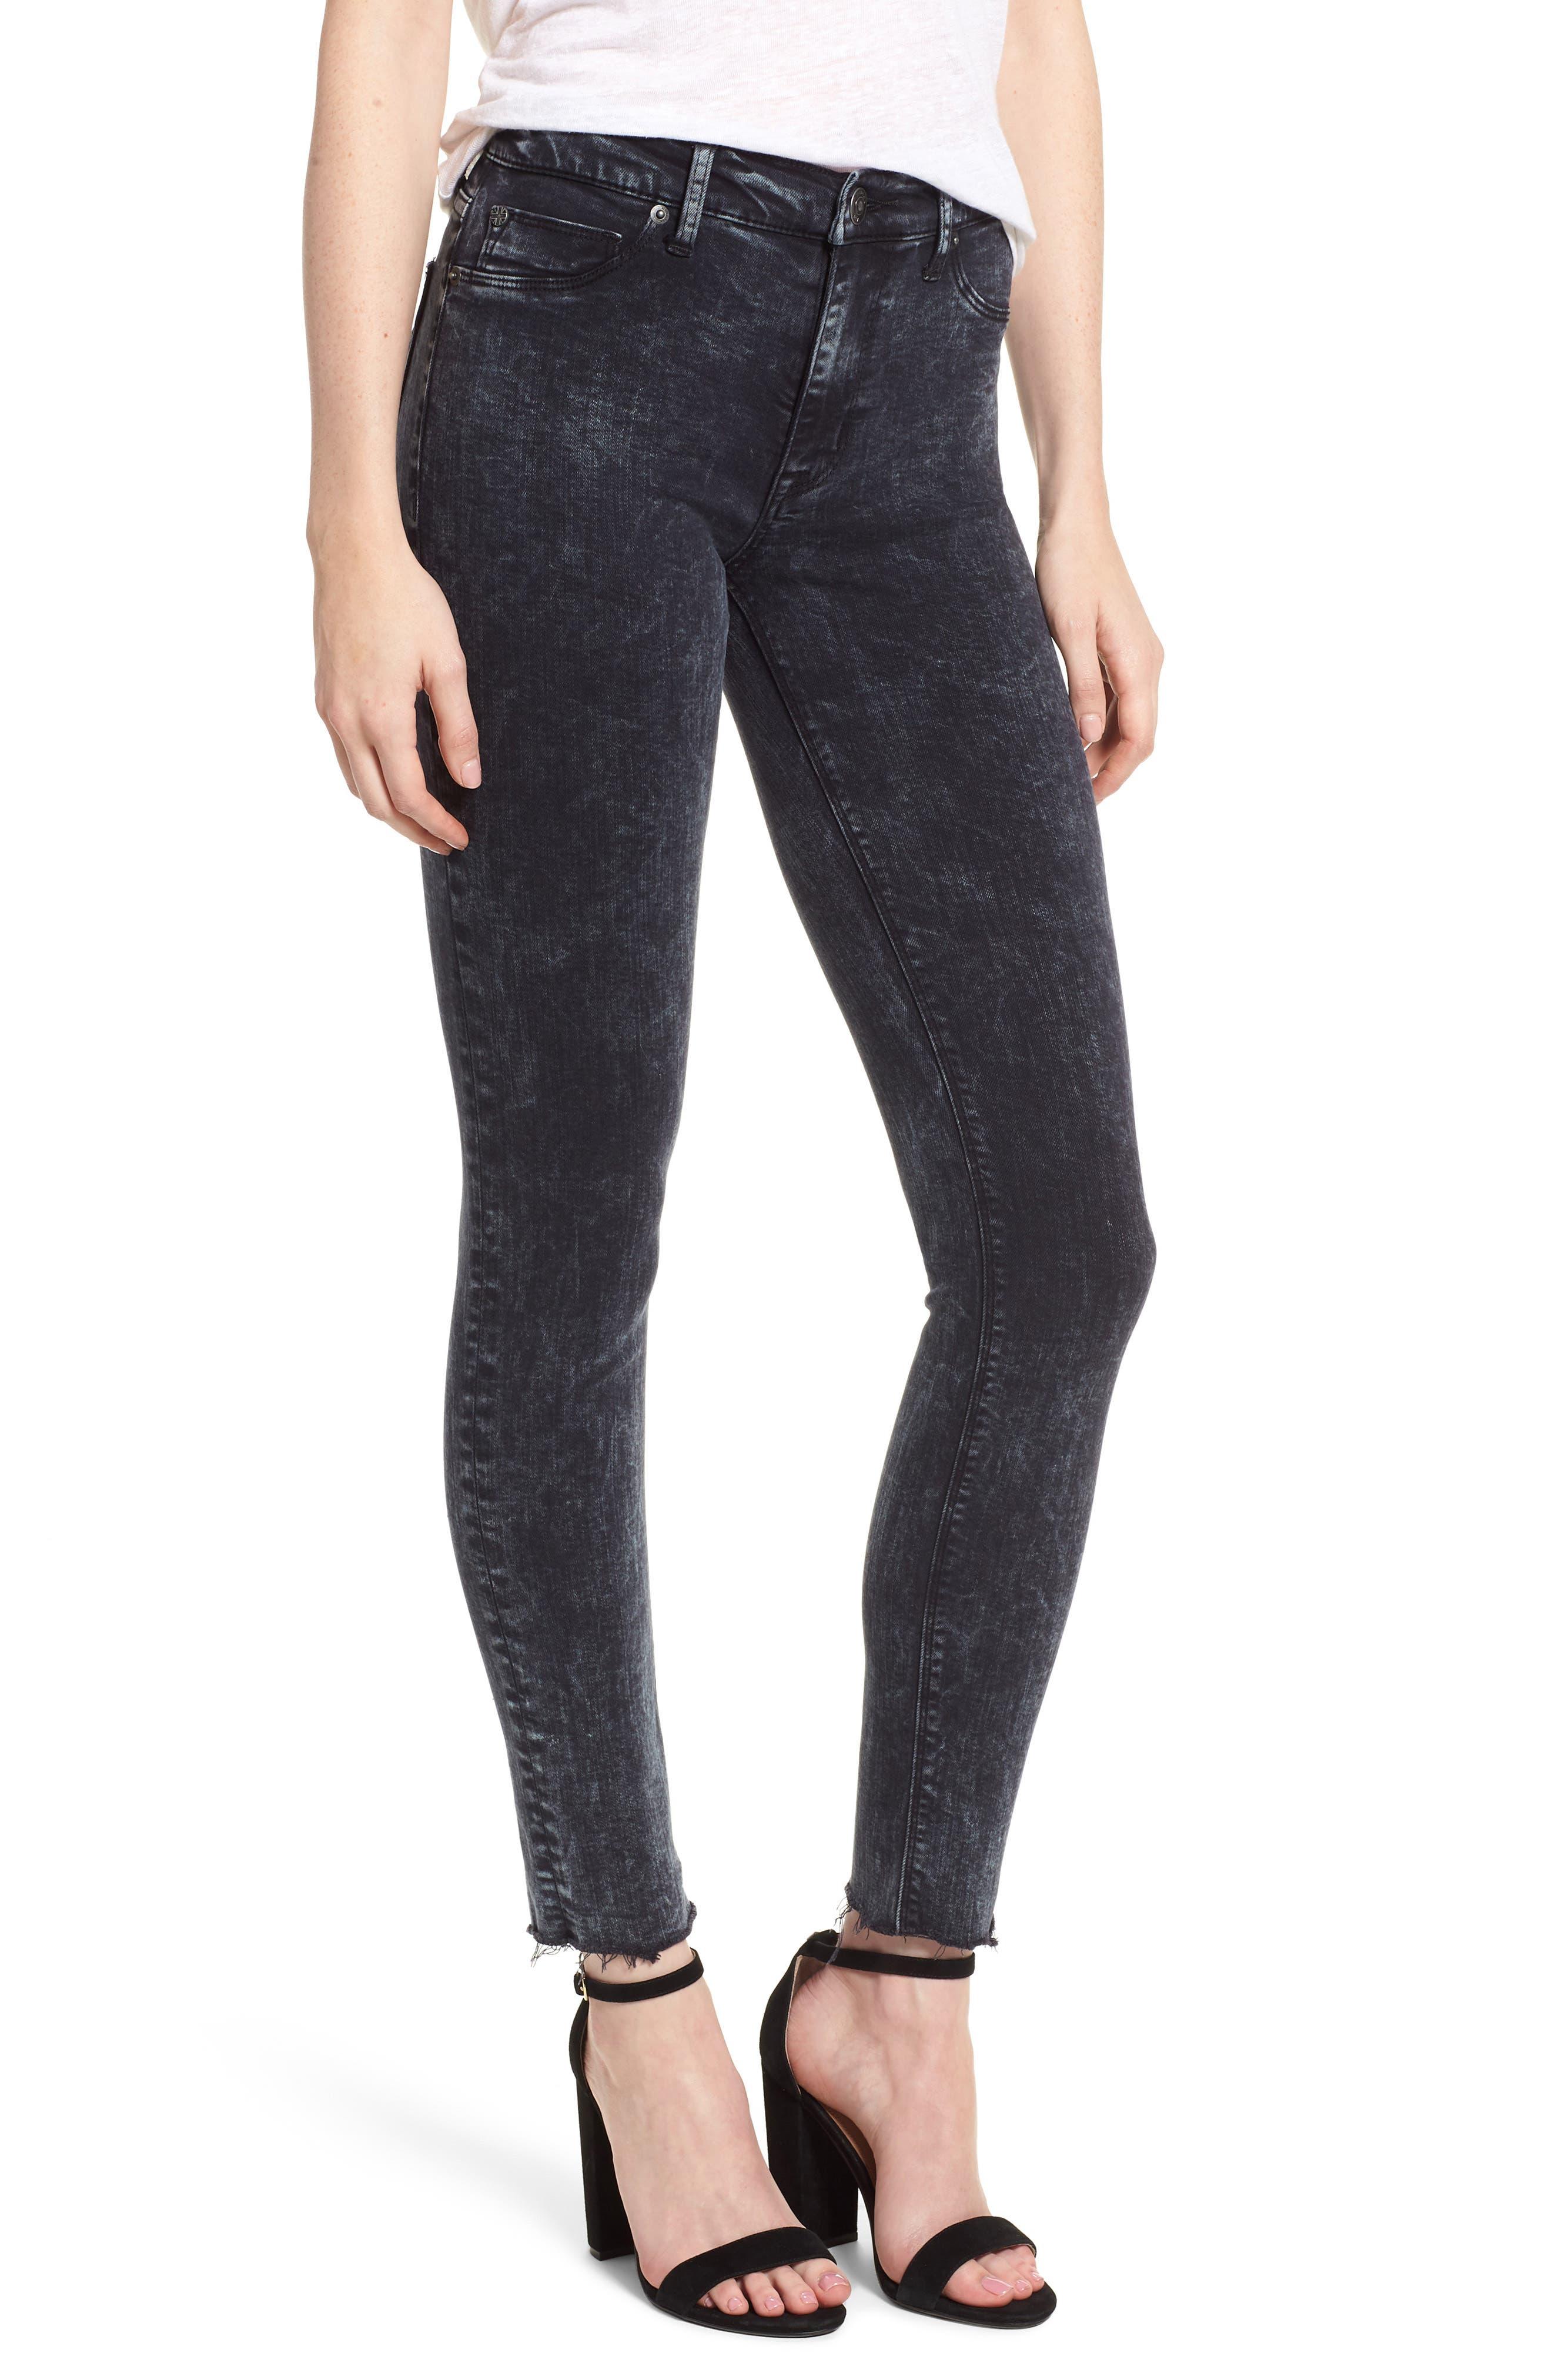 Barbara High Waist Ankle Skinny Jeans,                         Main,                         color, Dainty